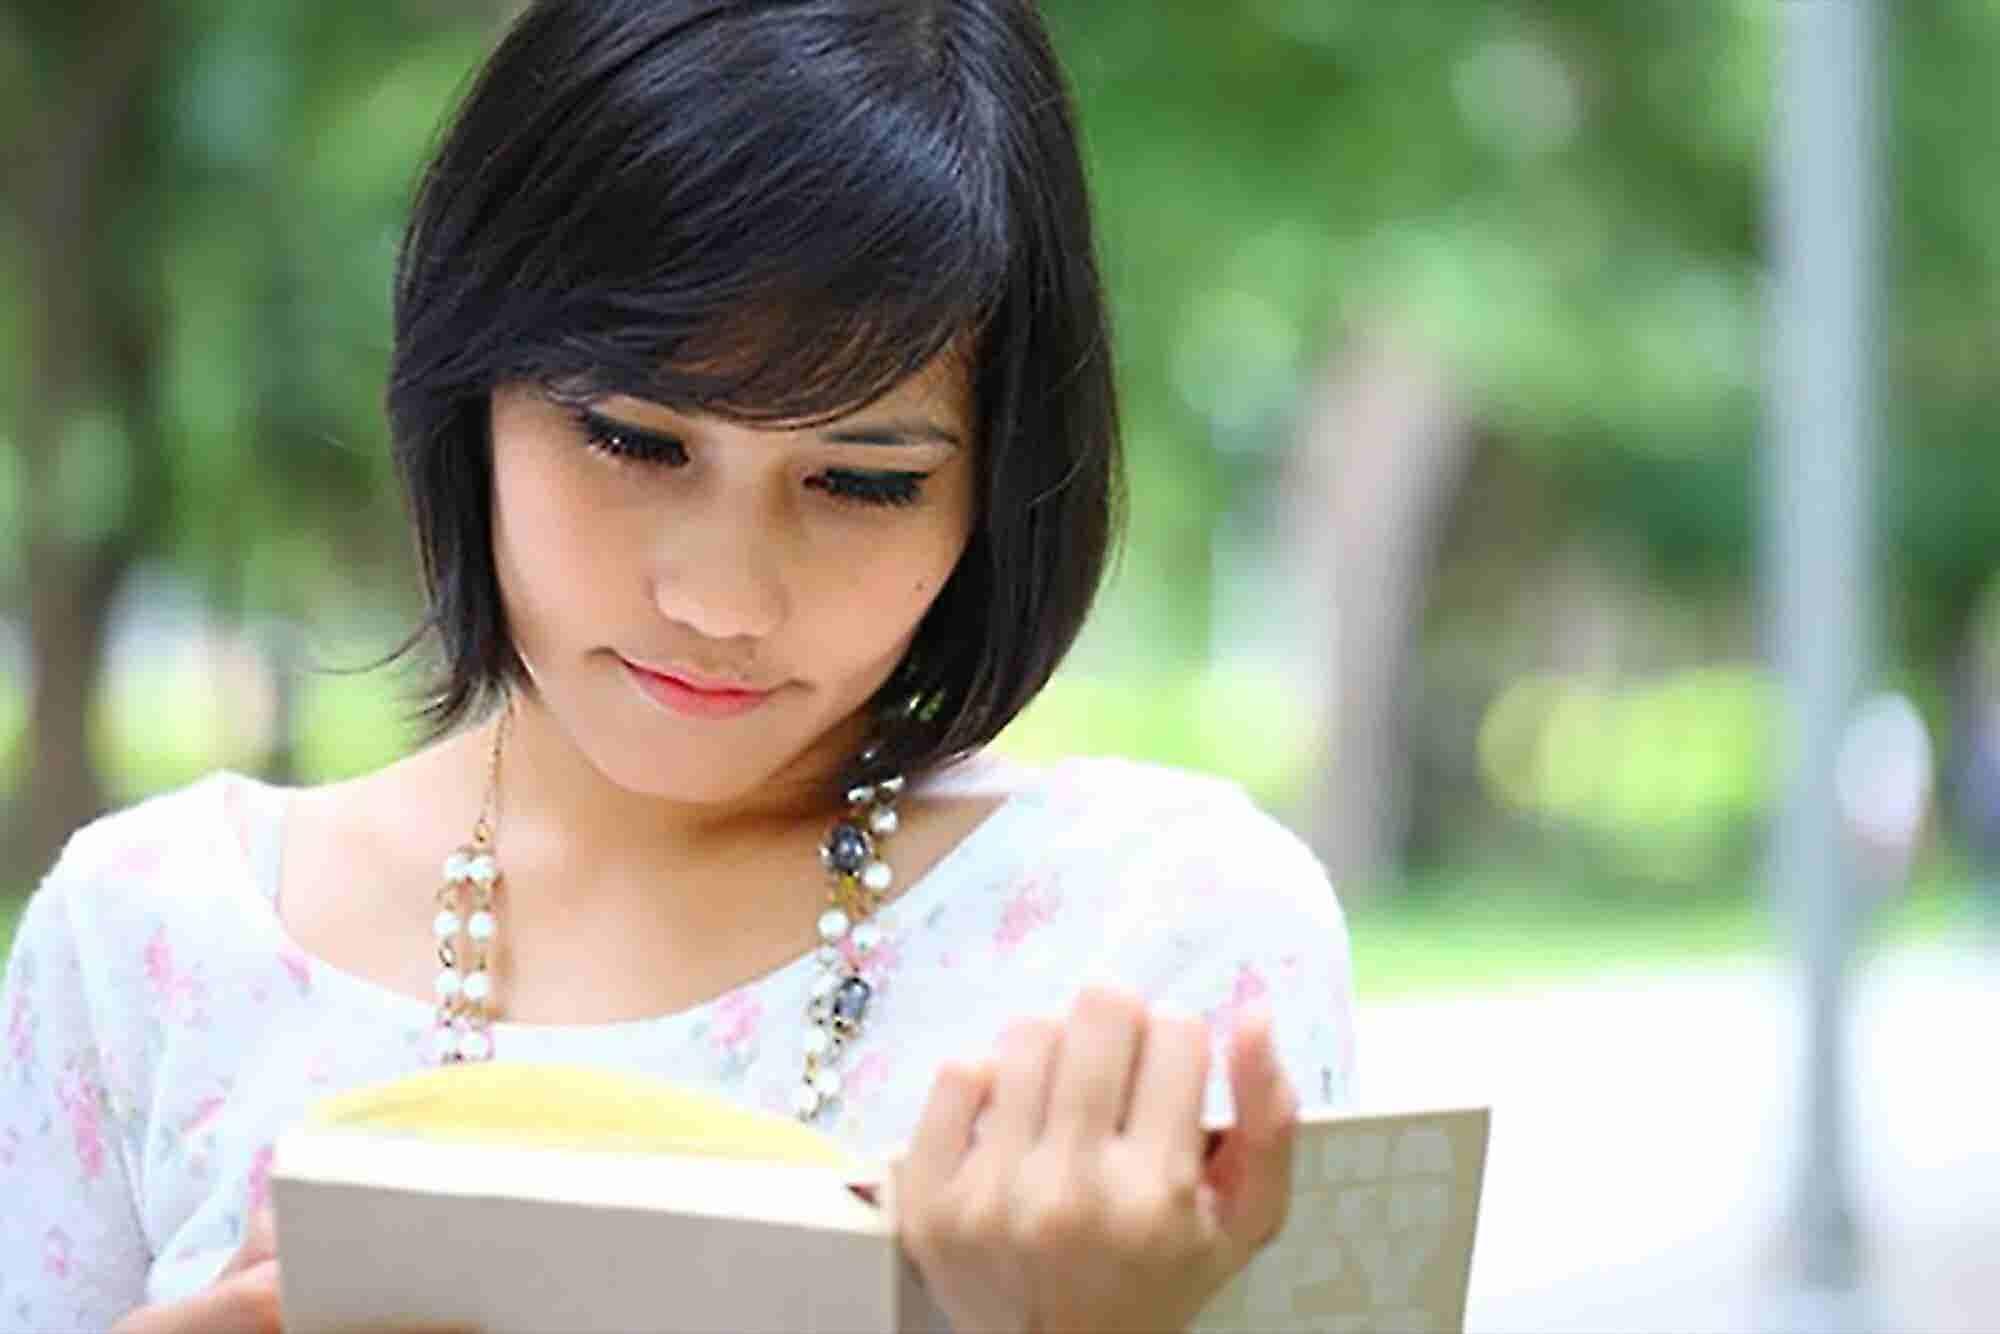 5 Surefire Ways to Attract College Talent